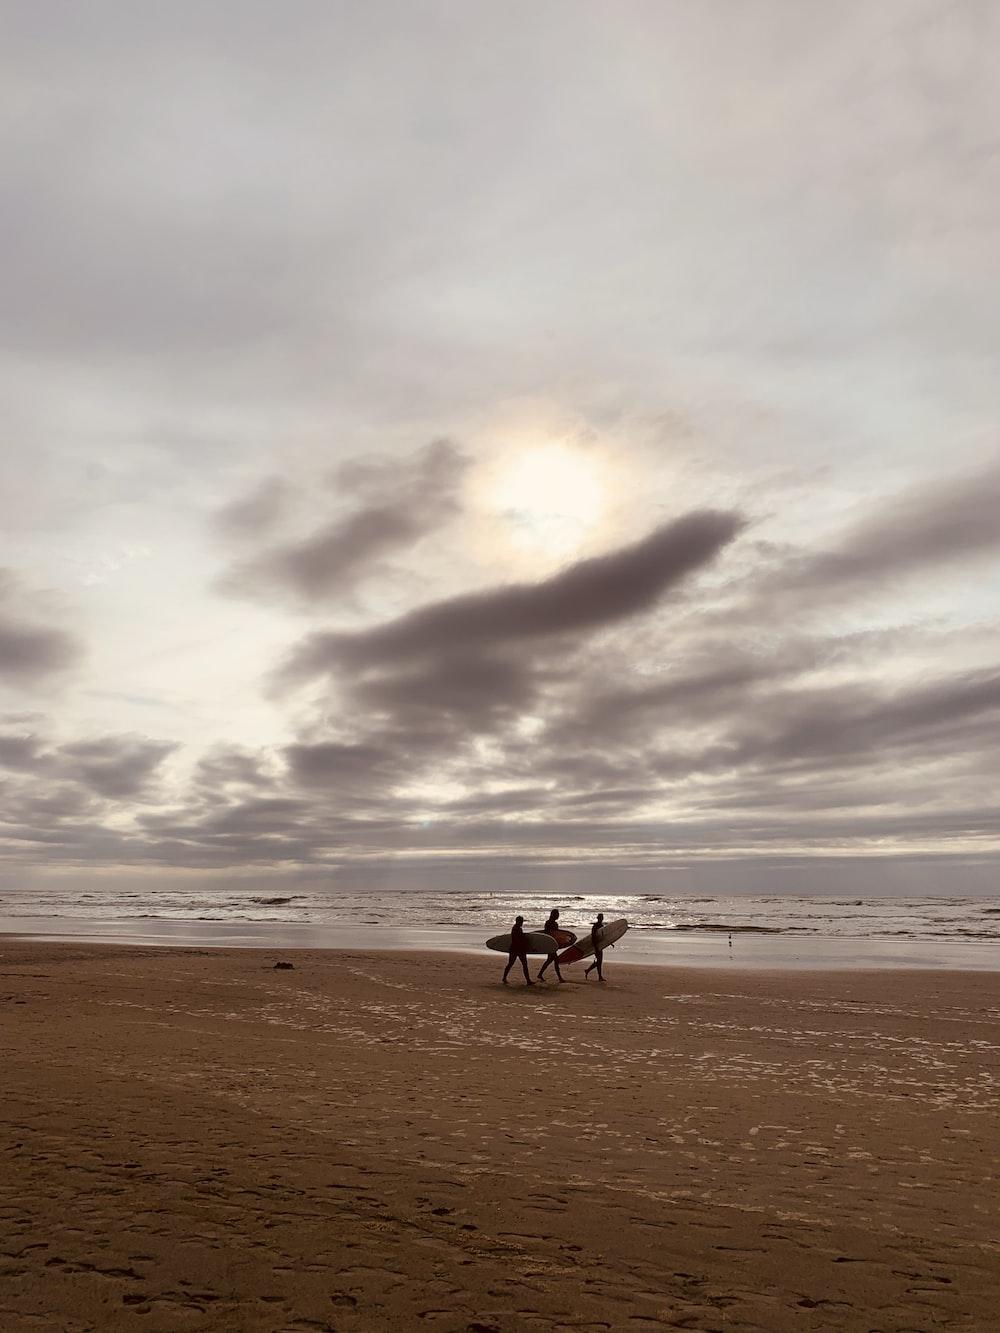 three people holding surfboard walking near seashore